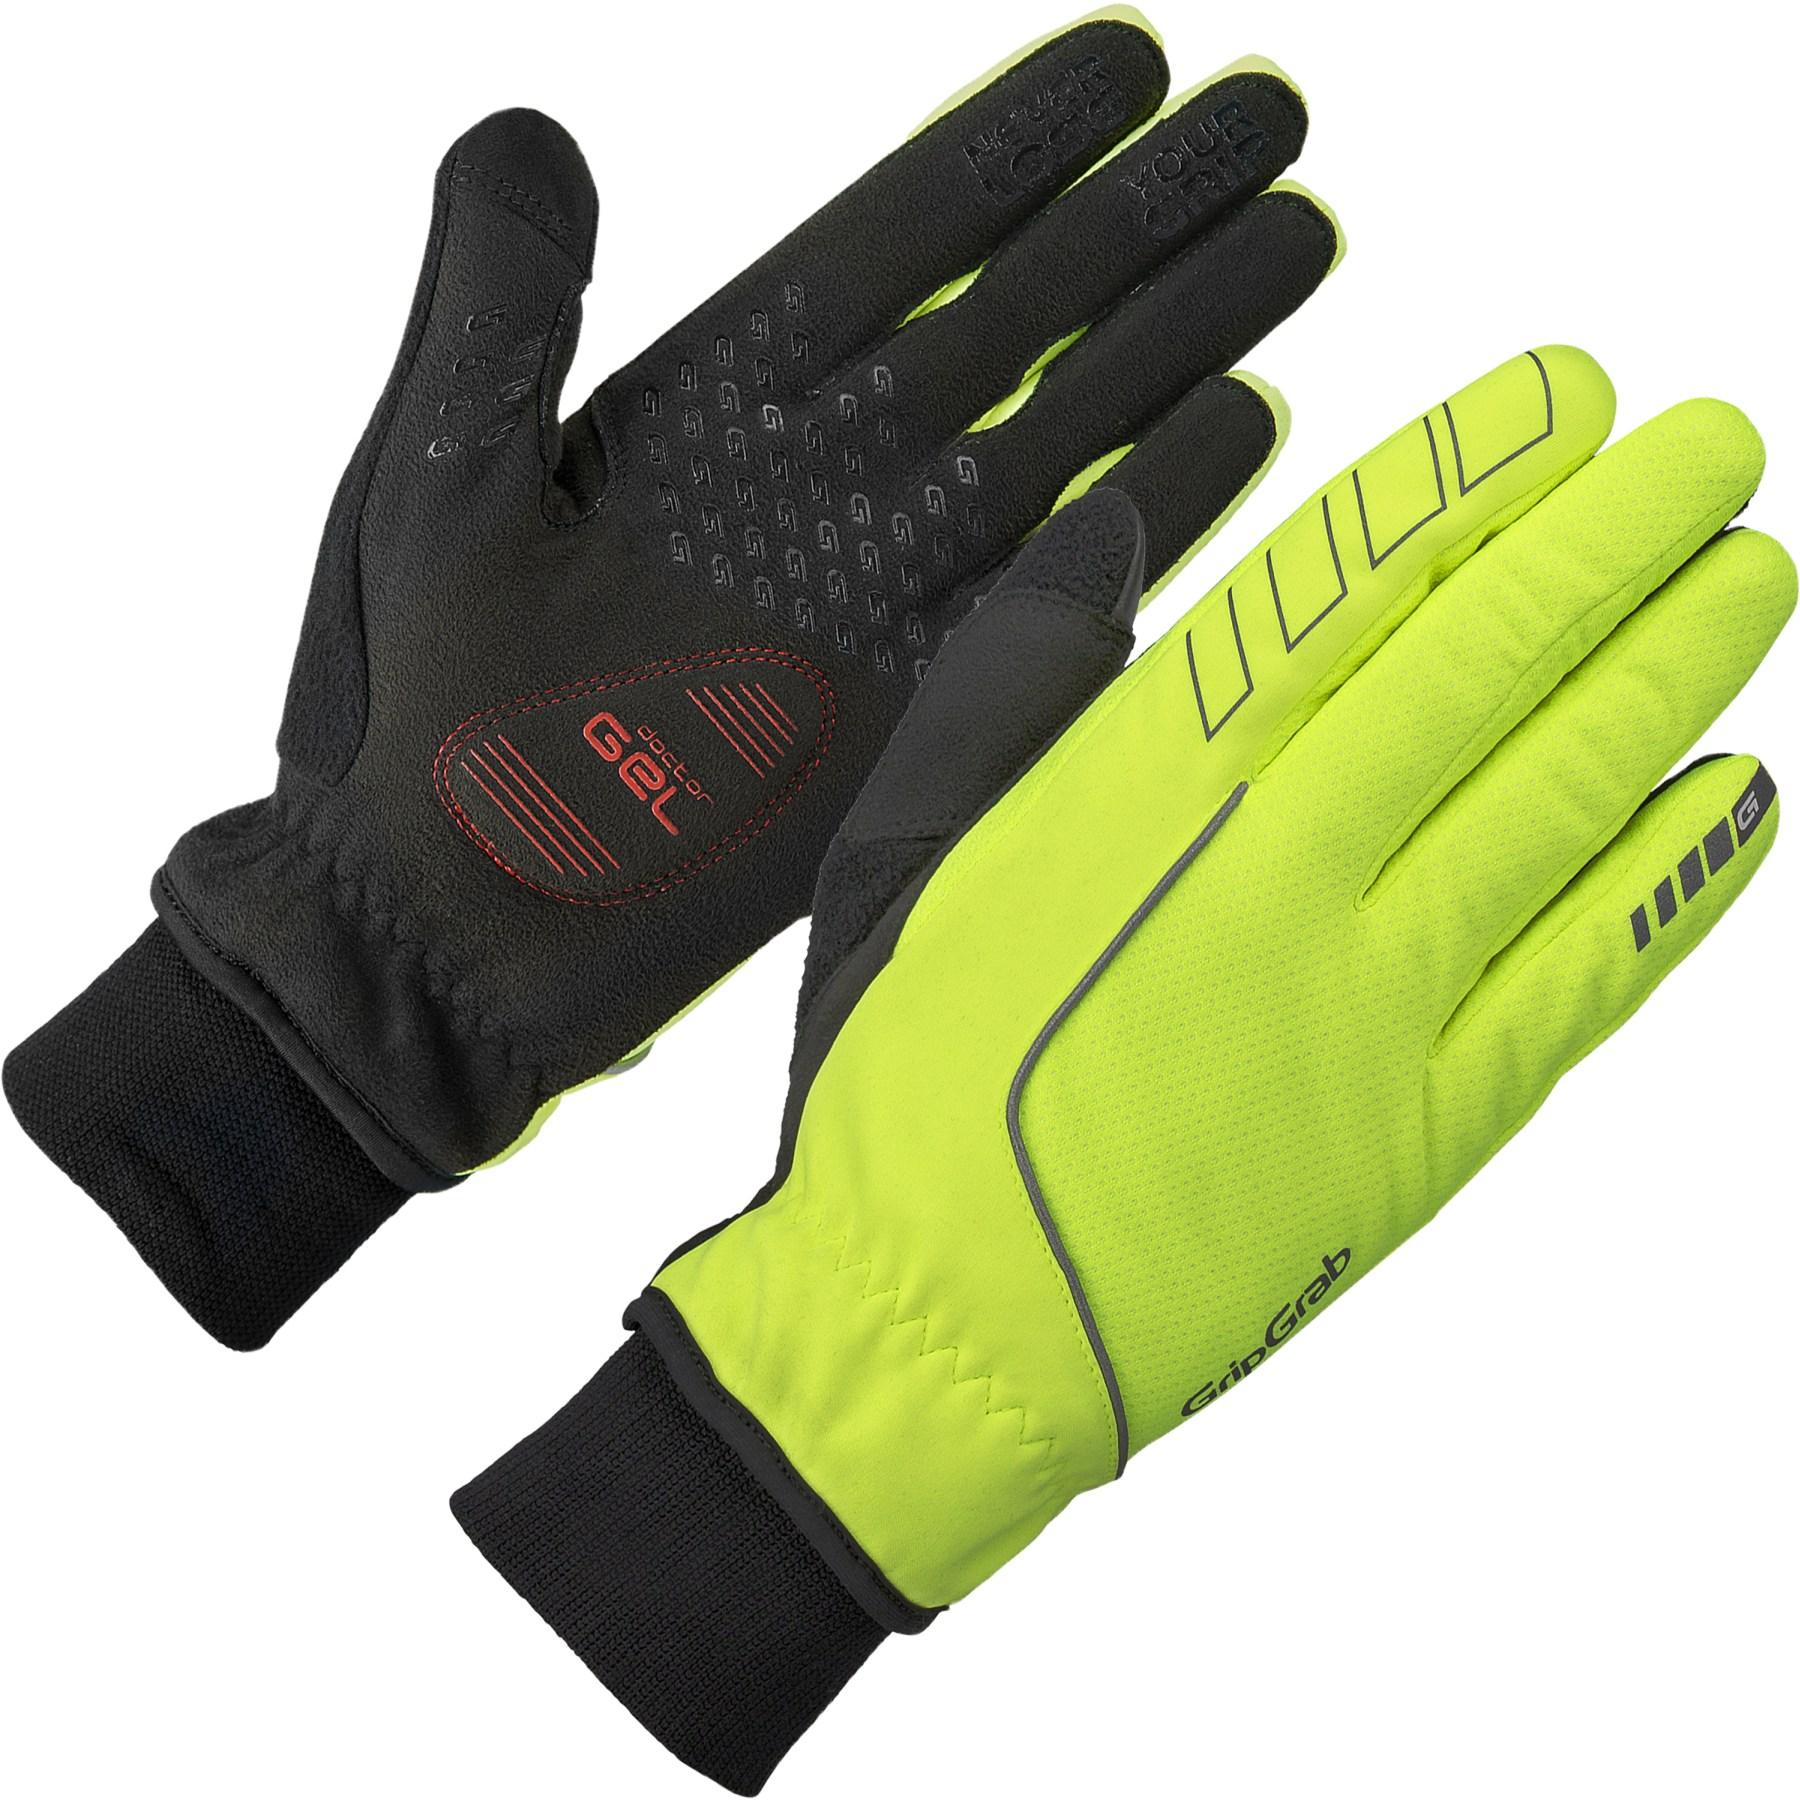 GripGrab Windster Hi-Vis Windproof Winter Glove - Yellow Hi-Vis